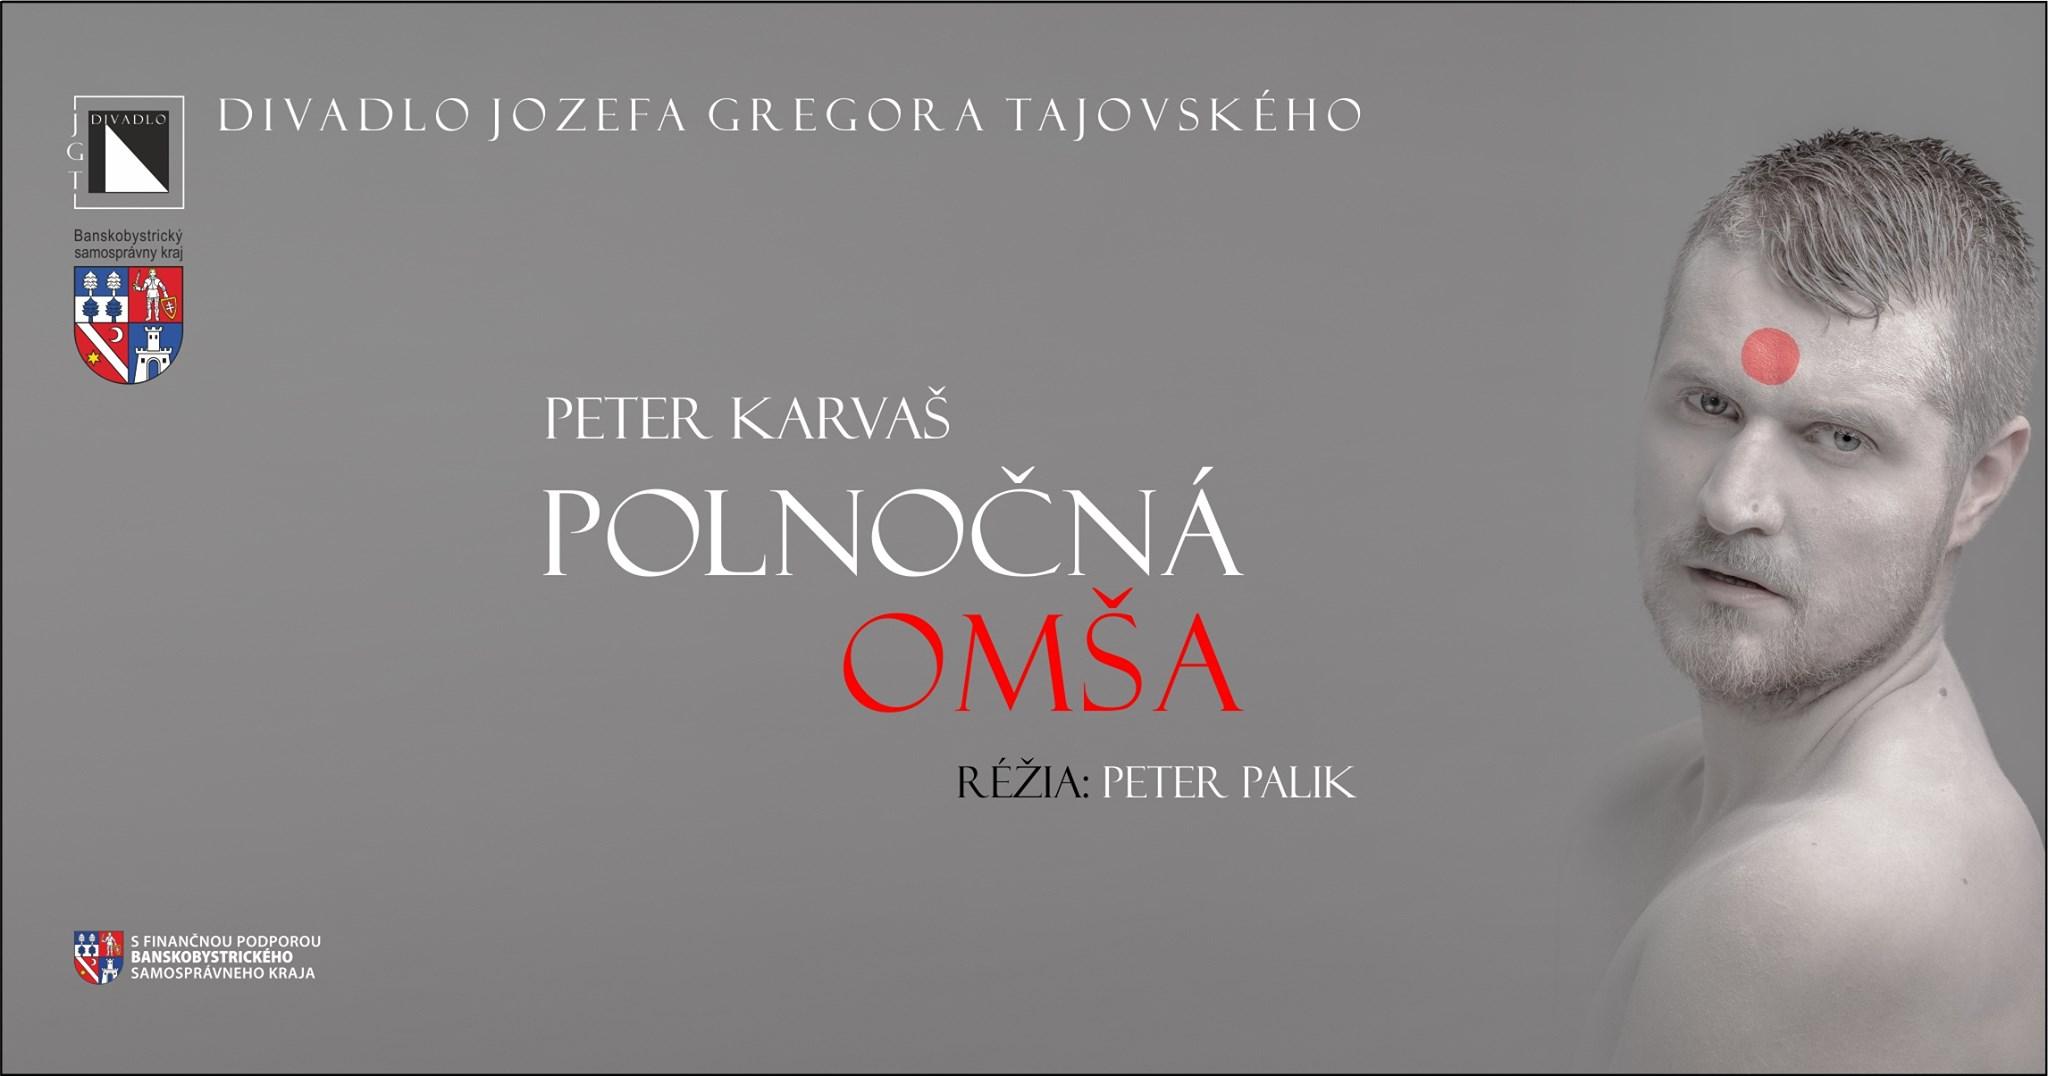 Peter Karvaš: Polnočná omša Divadlo Jozefa Gregora Tajovského